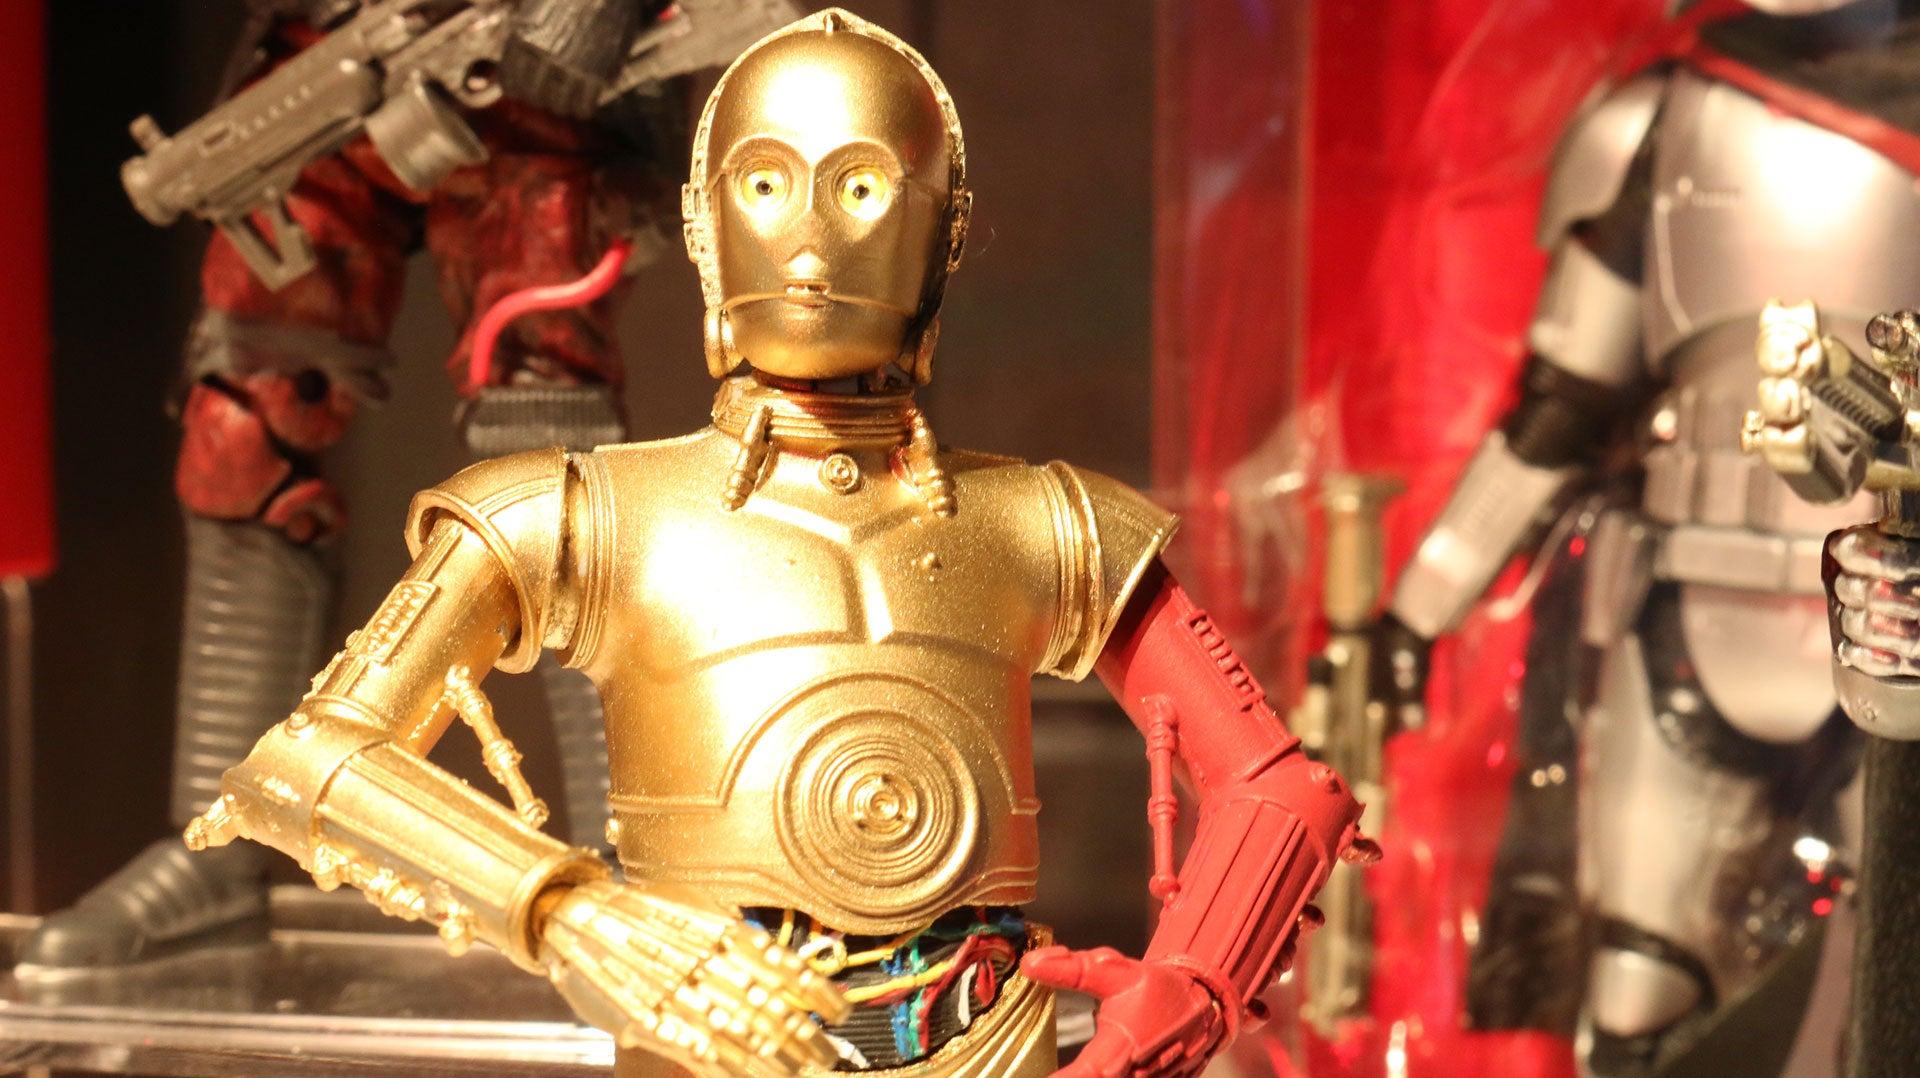 Fan Favourite Star Wars Rebel Gets The Action Figure She Deserves